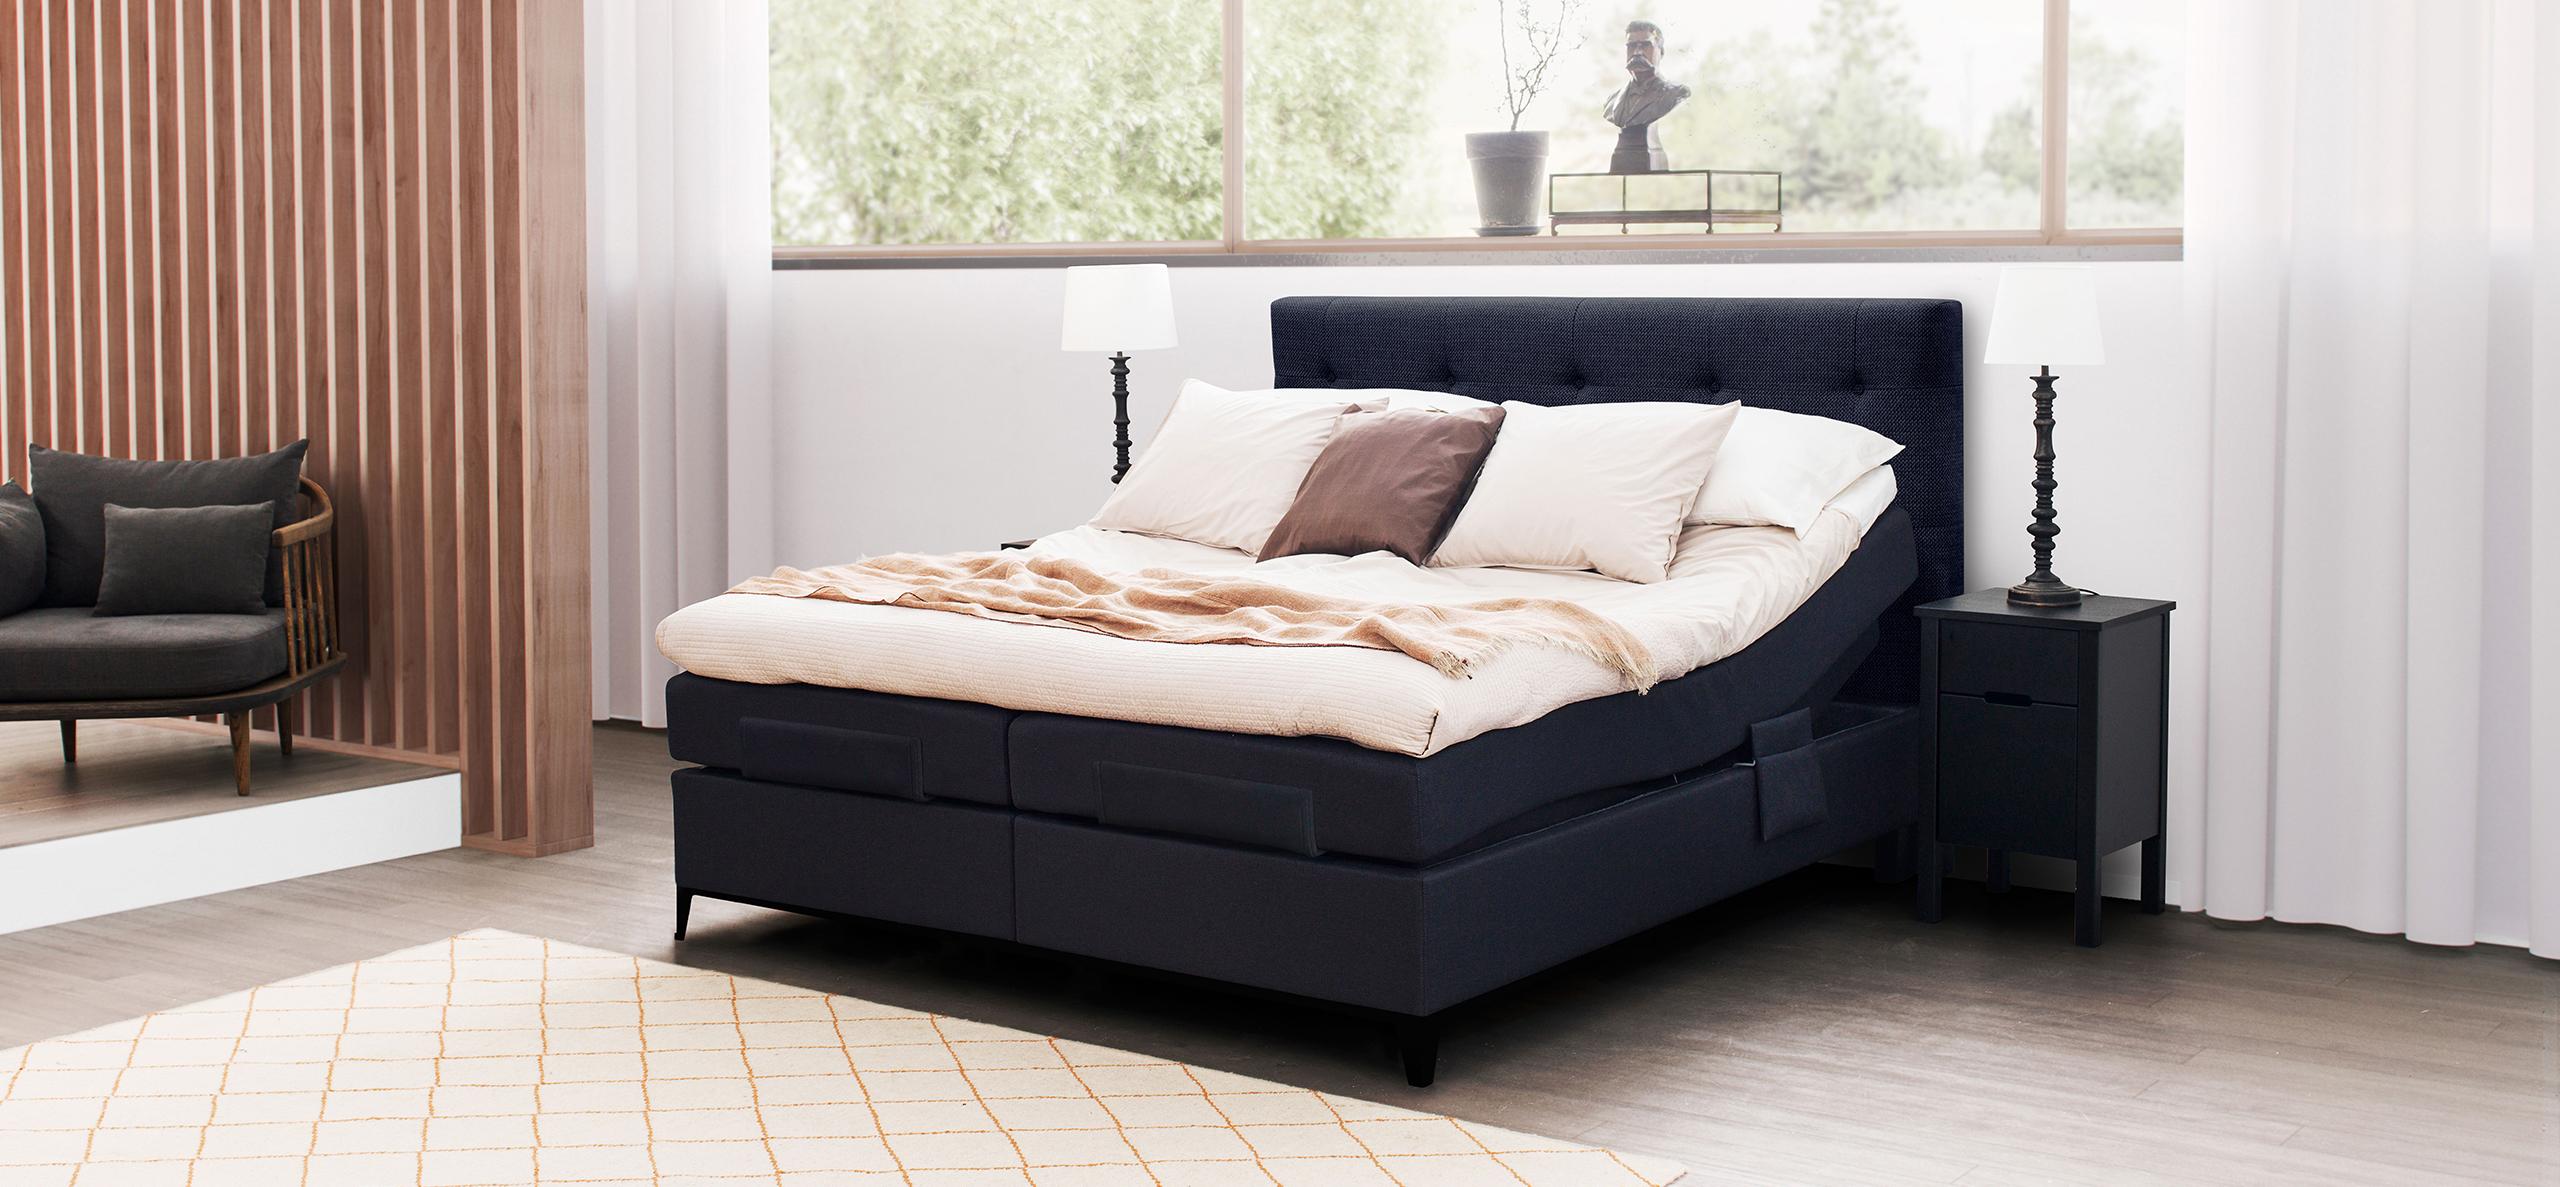 Strålende Bygg din egen Carat Aqtive II justerbar seng - Jensen Senger XT-29